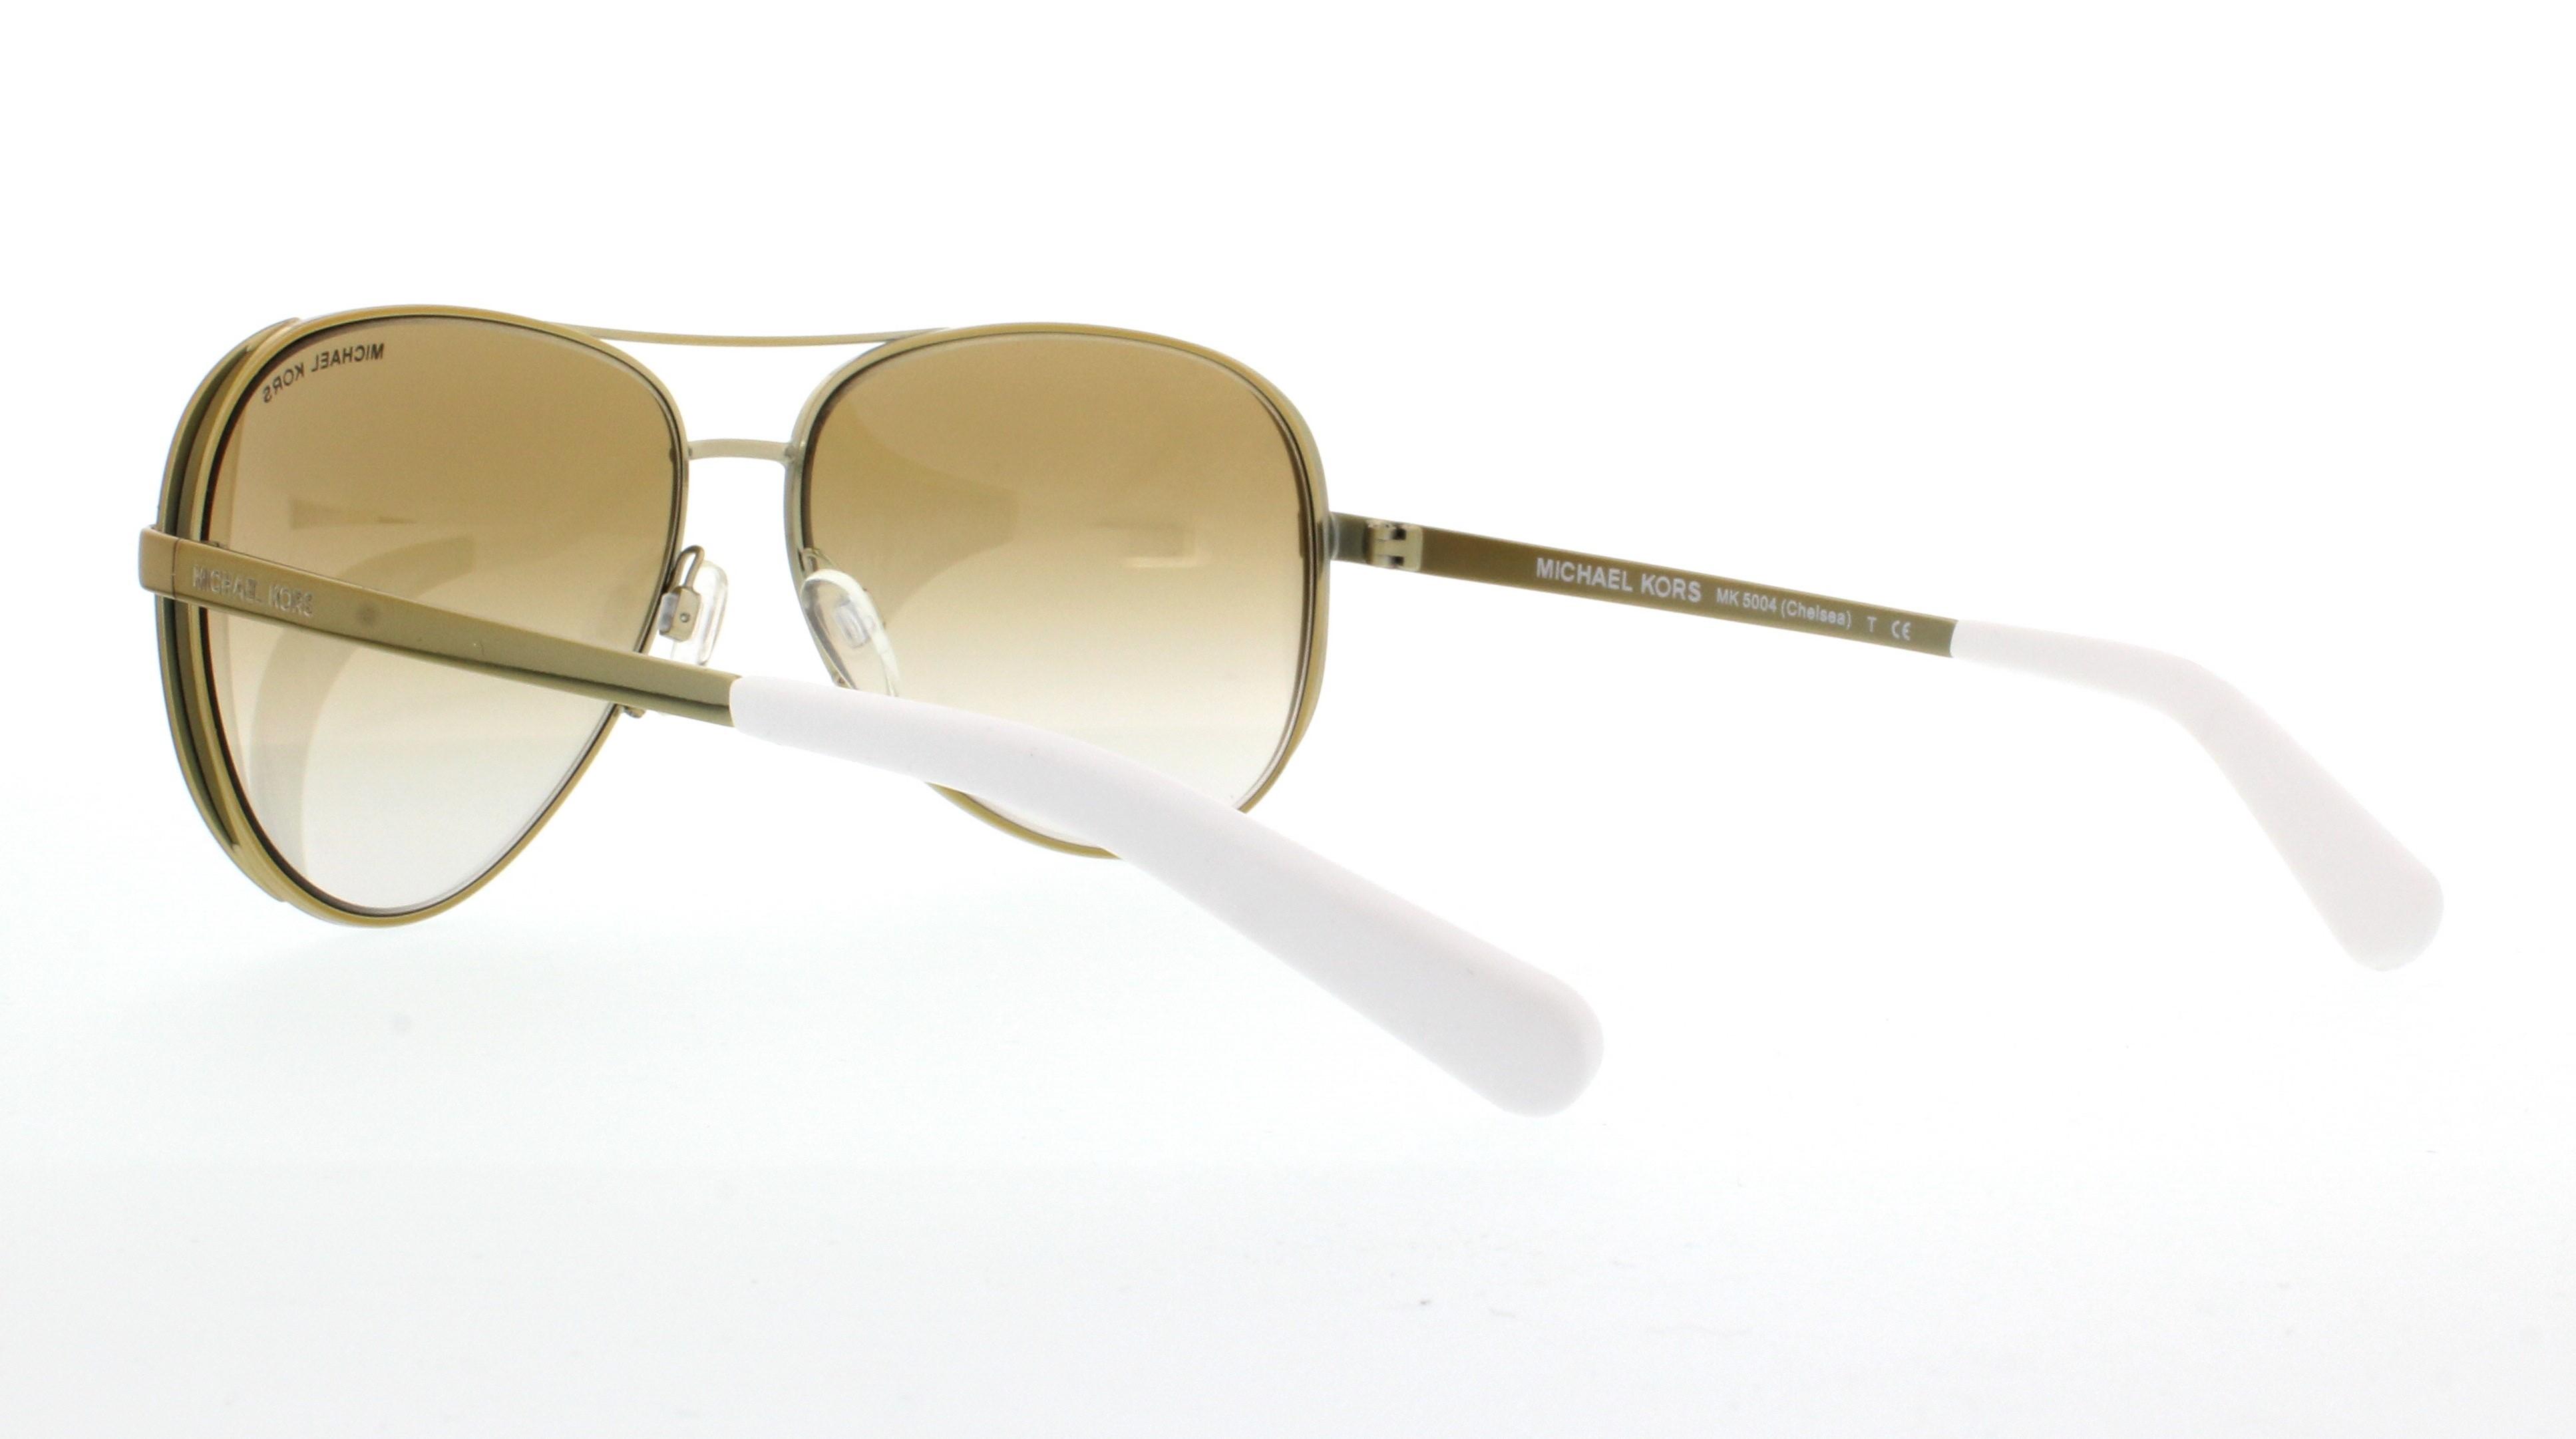 745821fb20 Designer Frames Outlet. Michael Kors MK5004 Chelsea